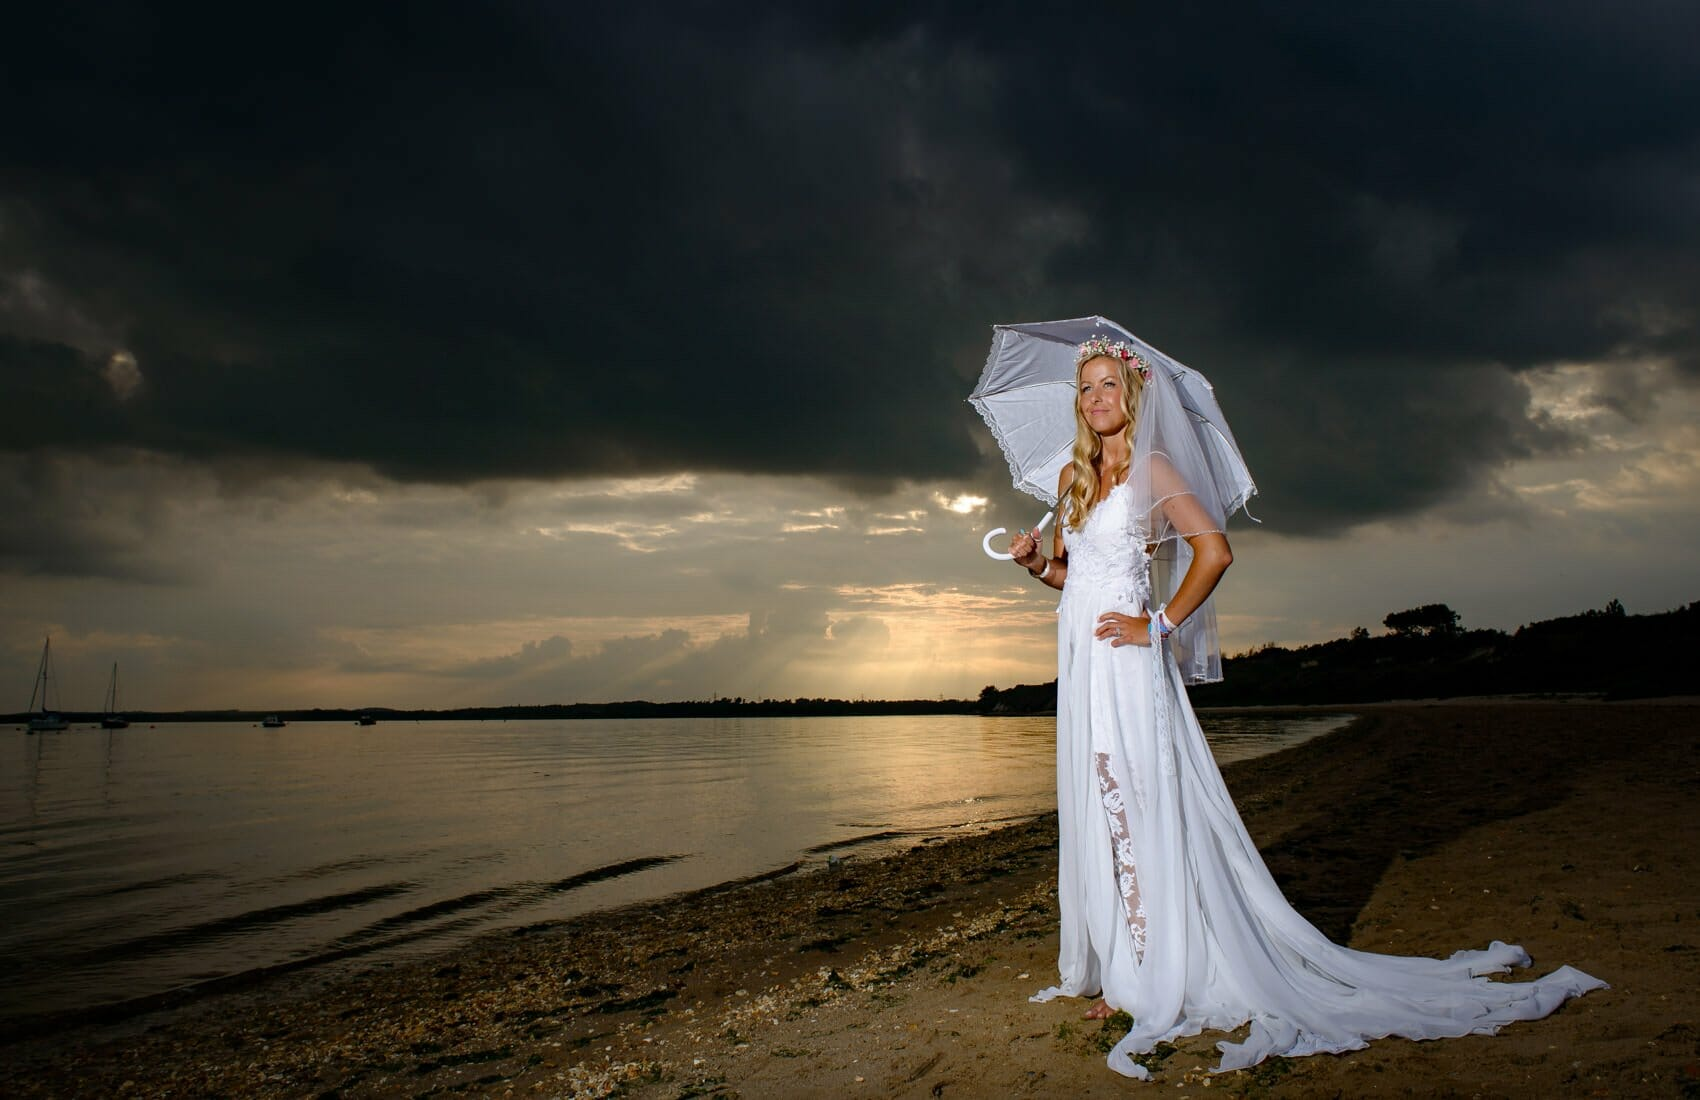 Stormy-beach-bride-with-parasol